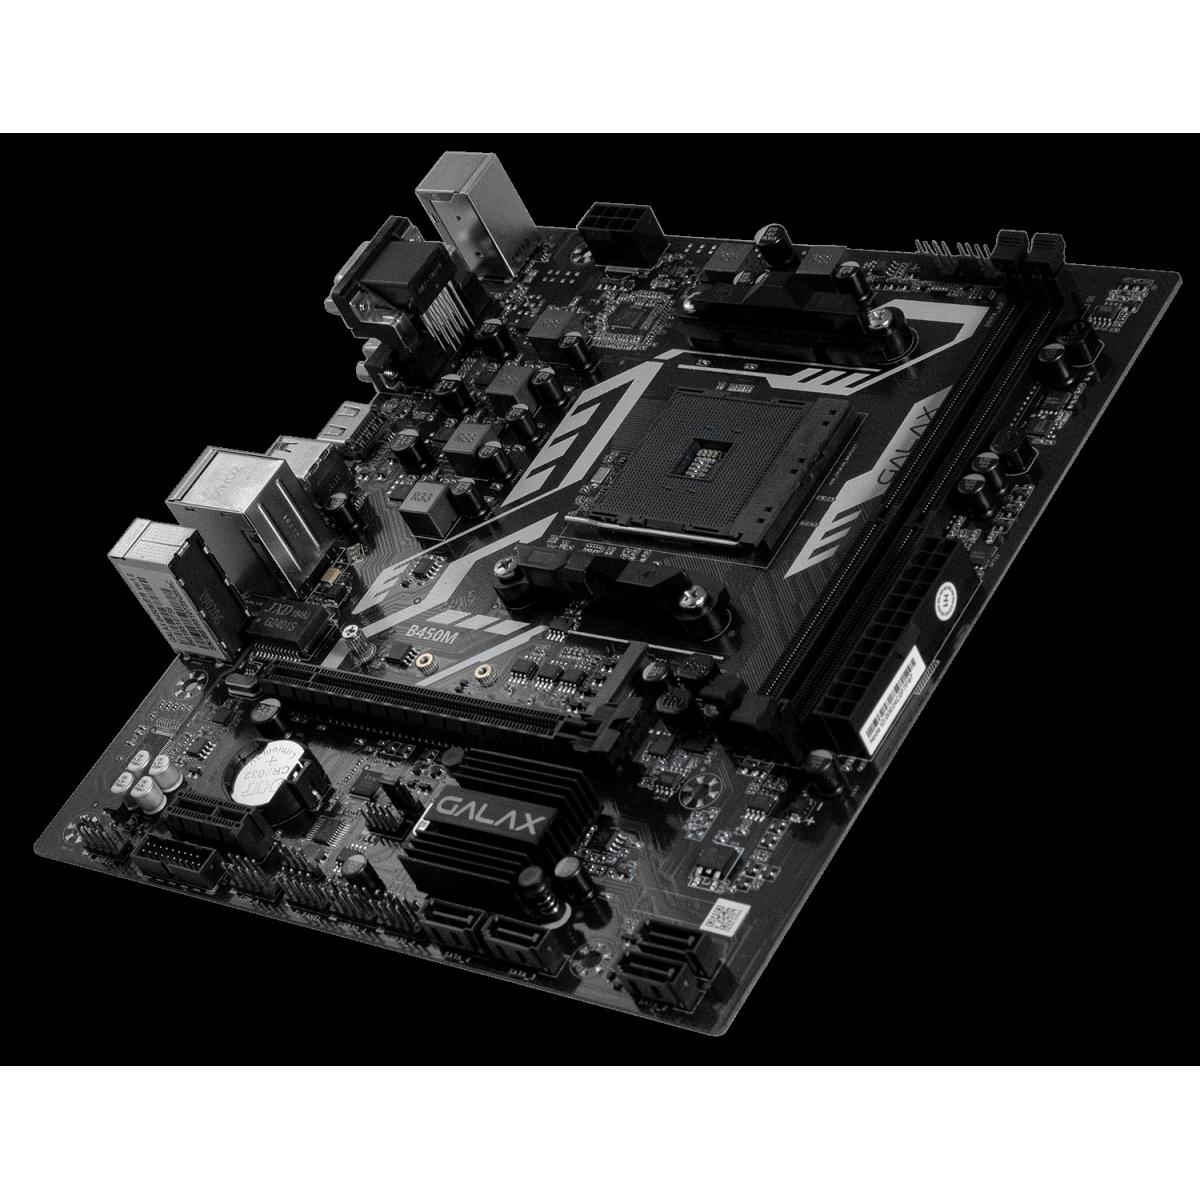 Placa Mãe Galax B450M, Chipset B450, AMD AM4, mATX, DDR4, AB450MAGCHJ1CW